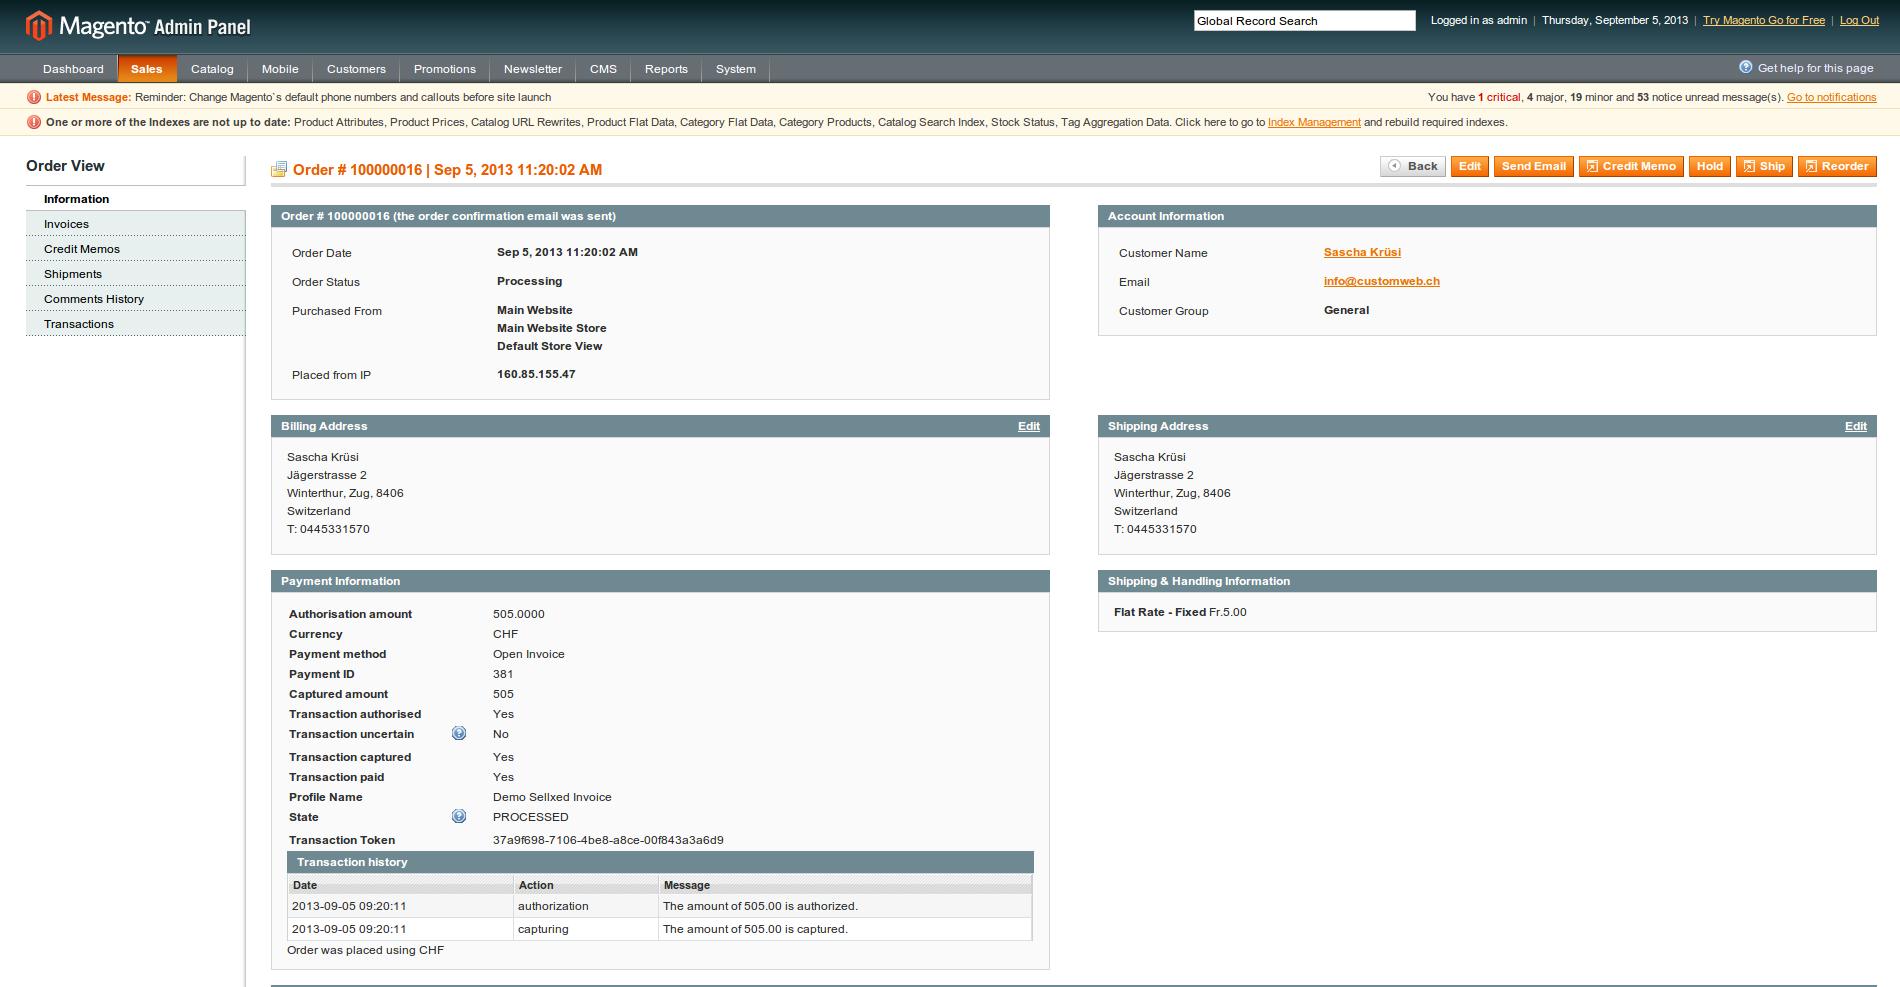 Customweb GmbH Magento Curabill Invoicing Module - Open invoice payment method